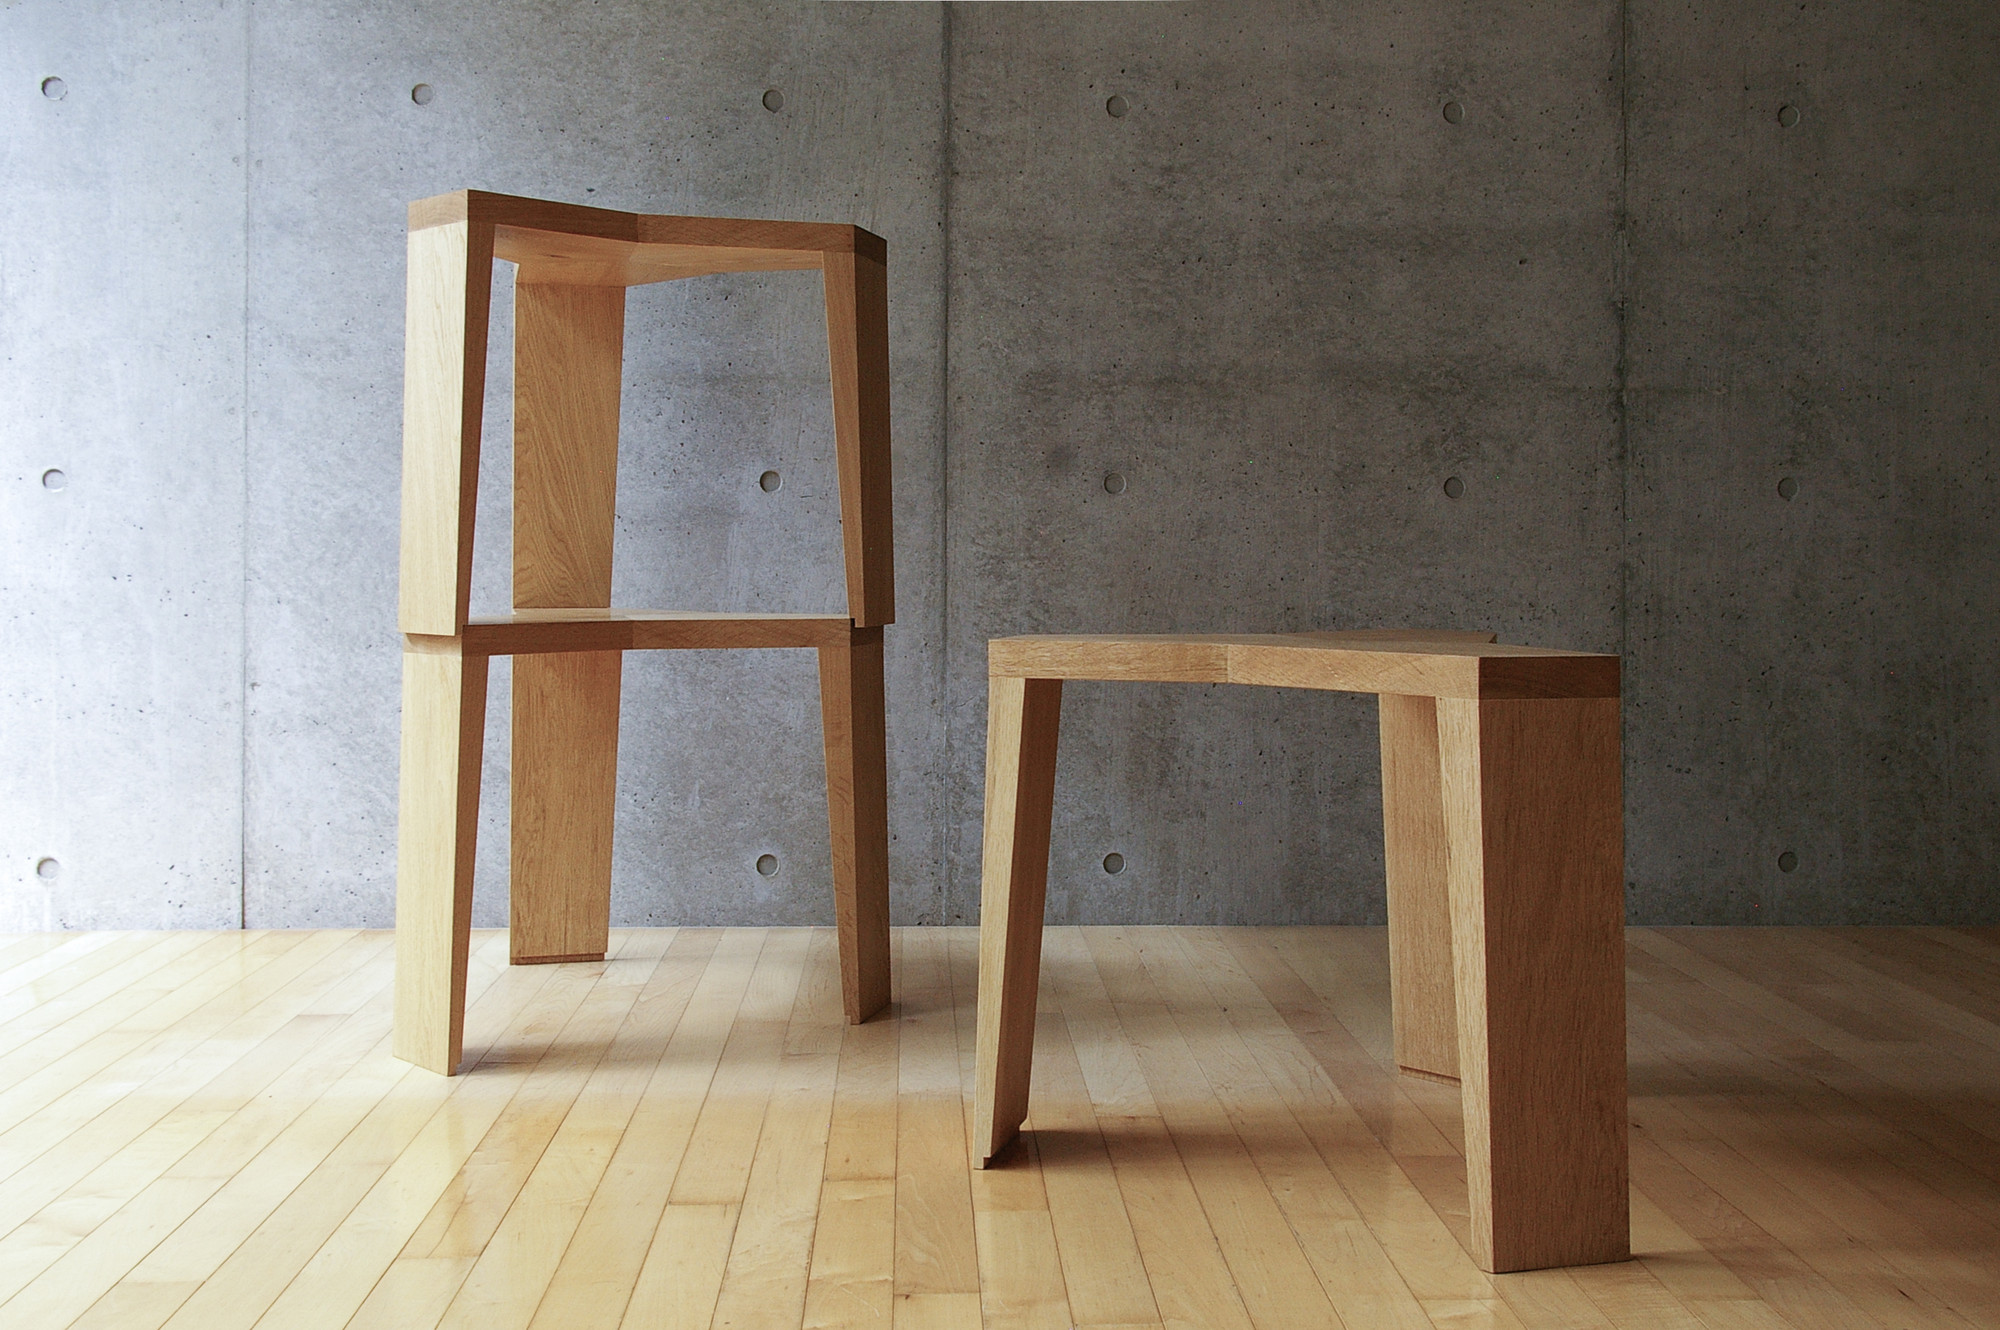 Taburetes YATA / Naoki Hirakoso, Courtesy of Naoki Hirakoso